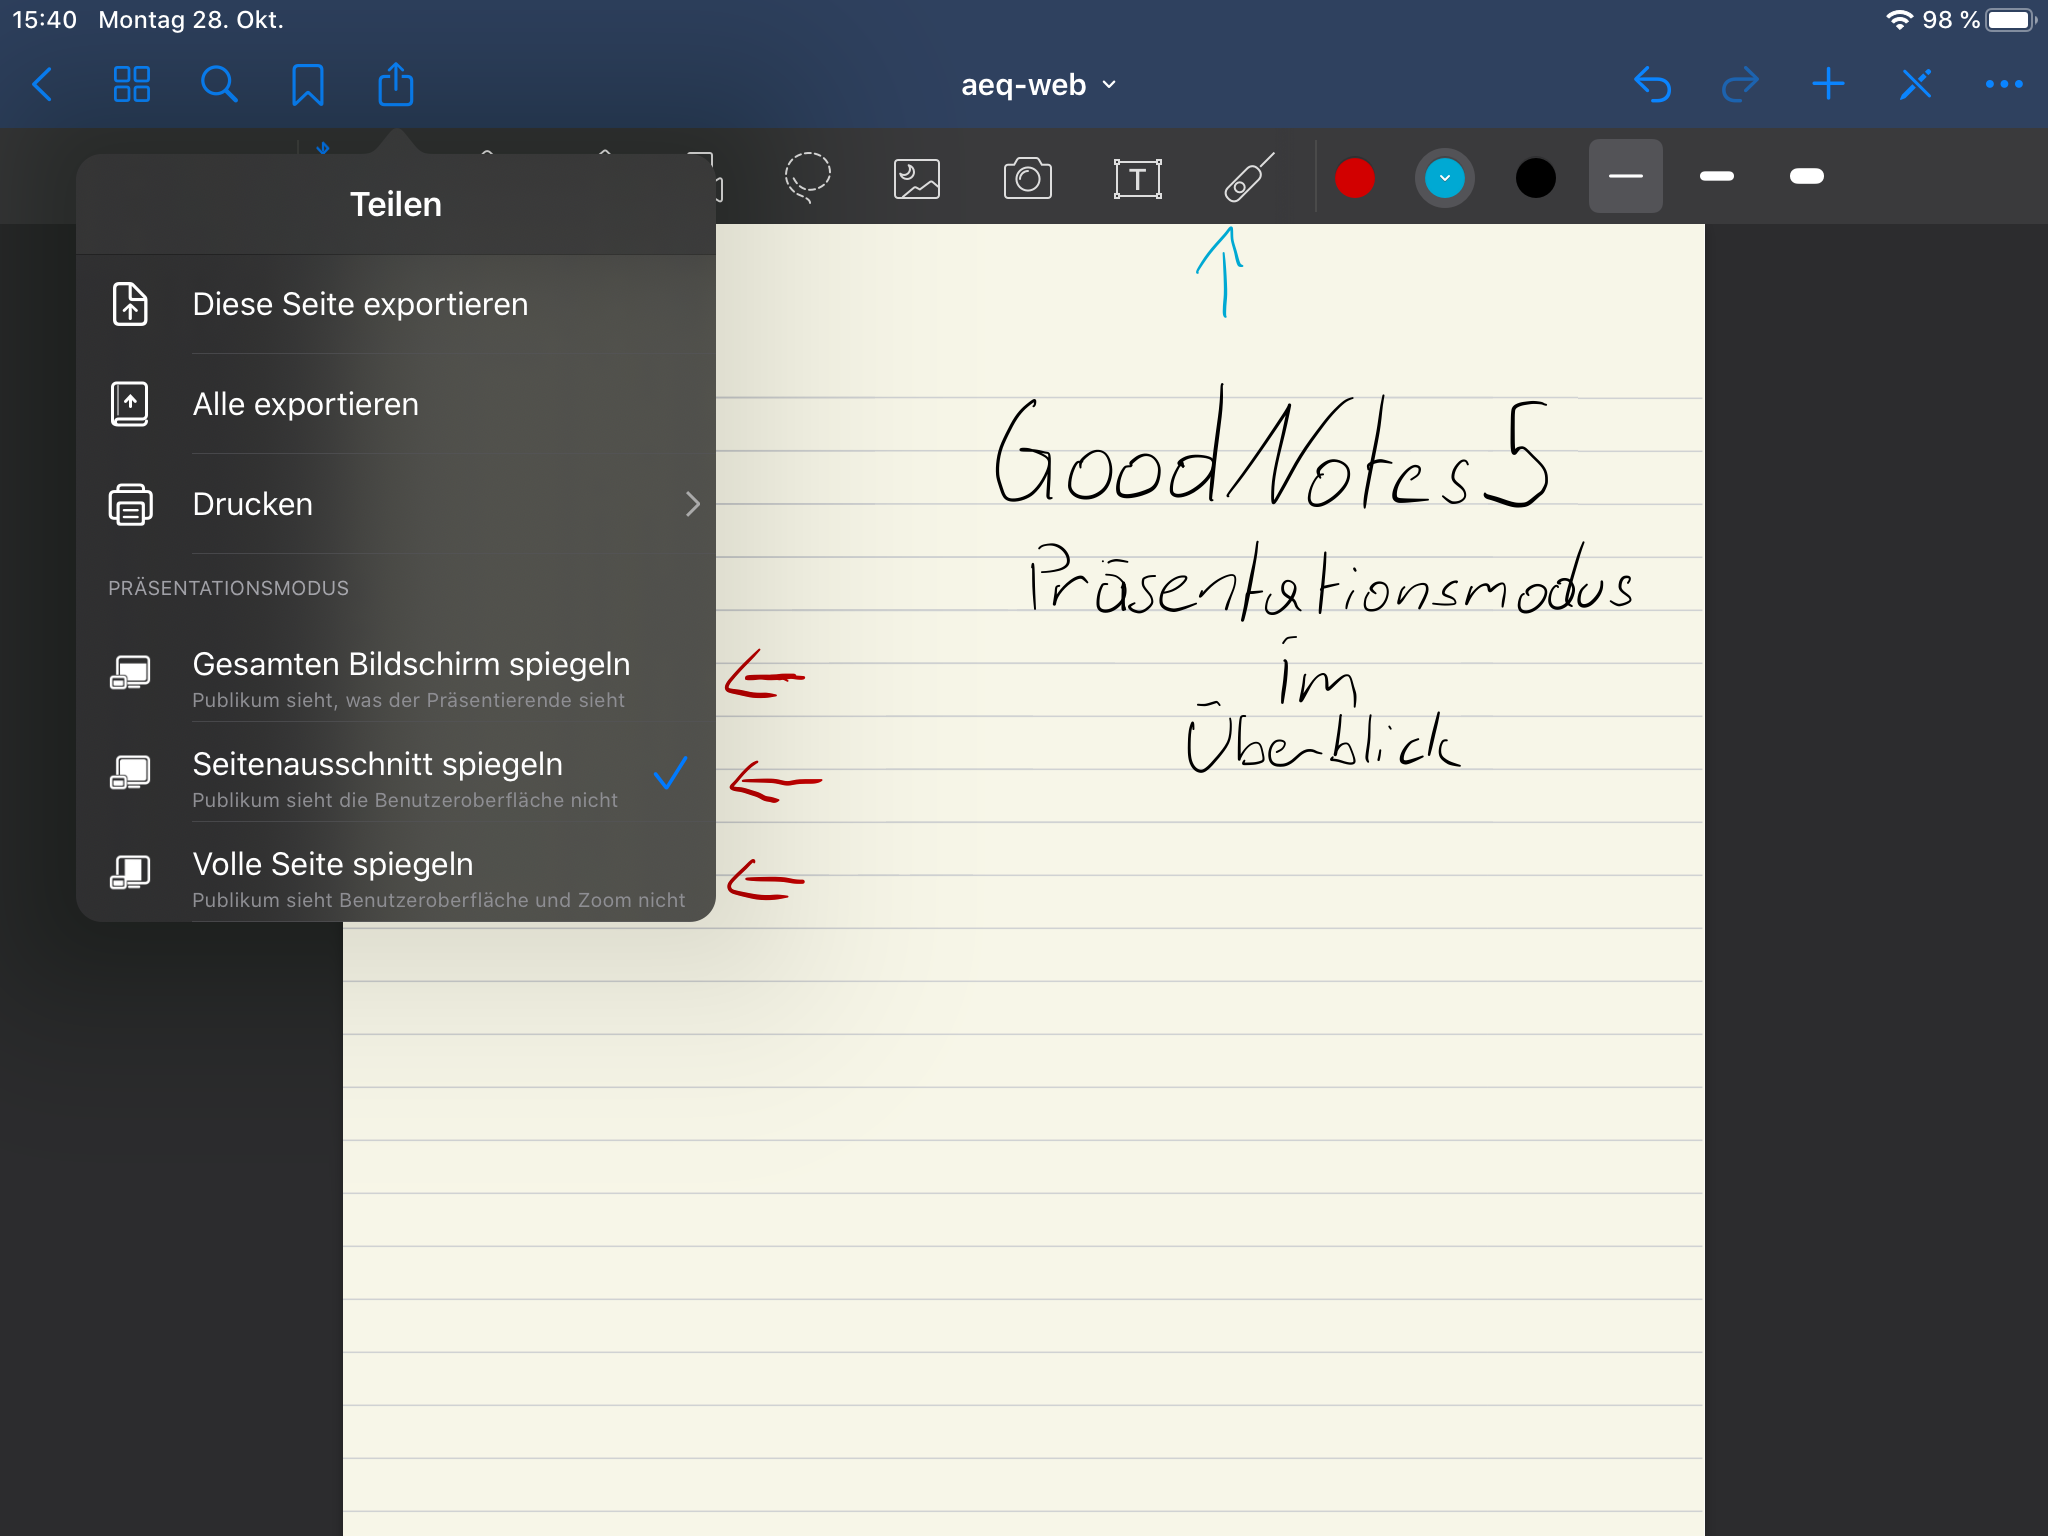 GoodNotes5_praesentationsmodus